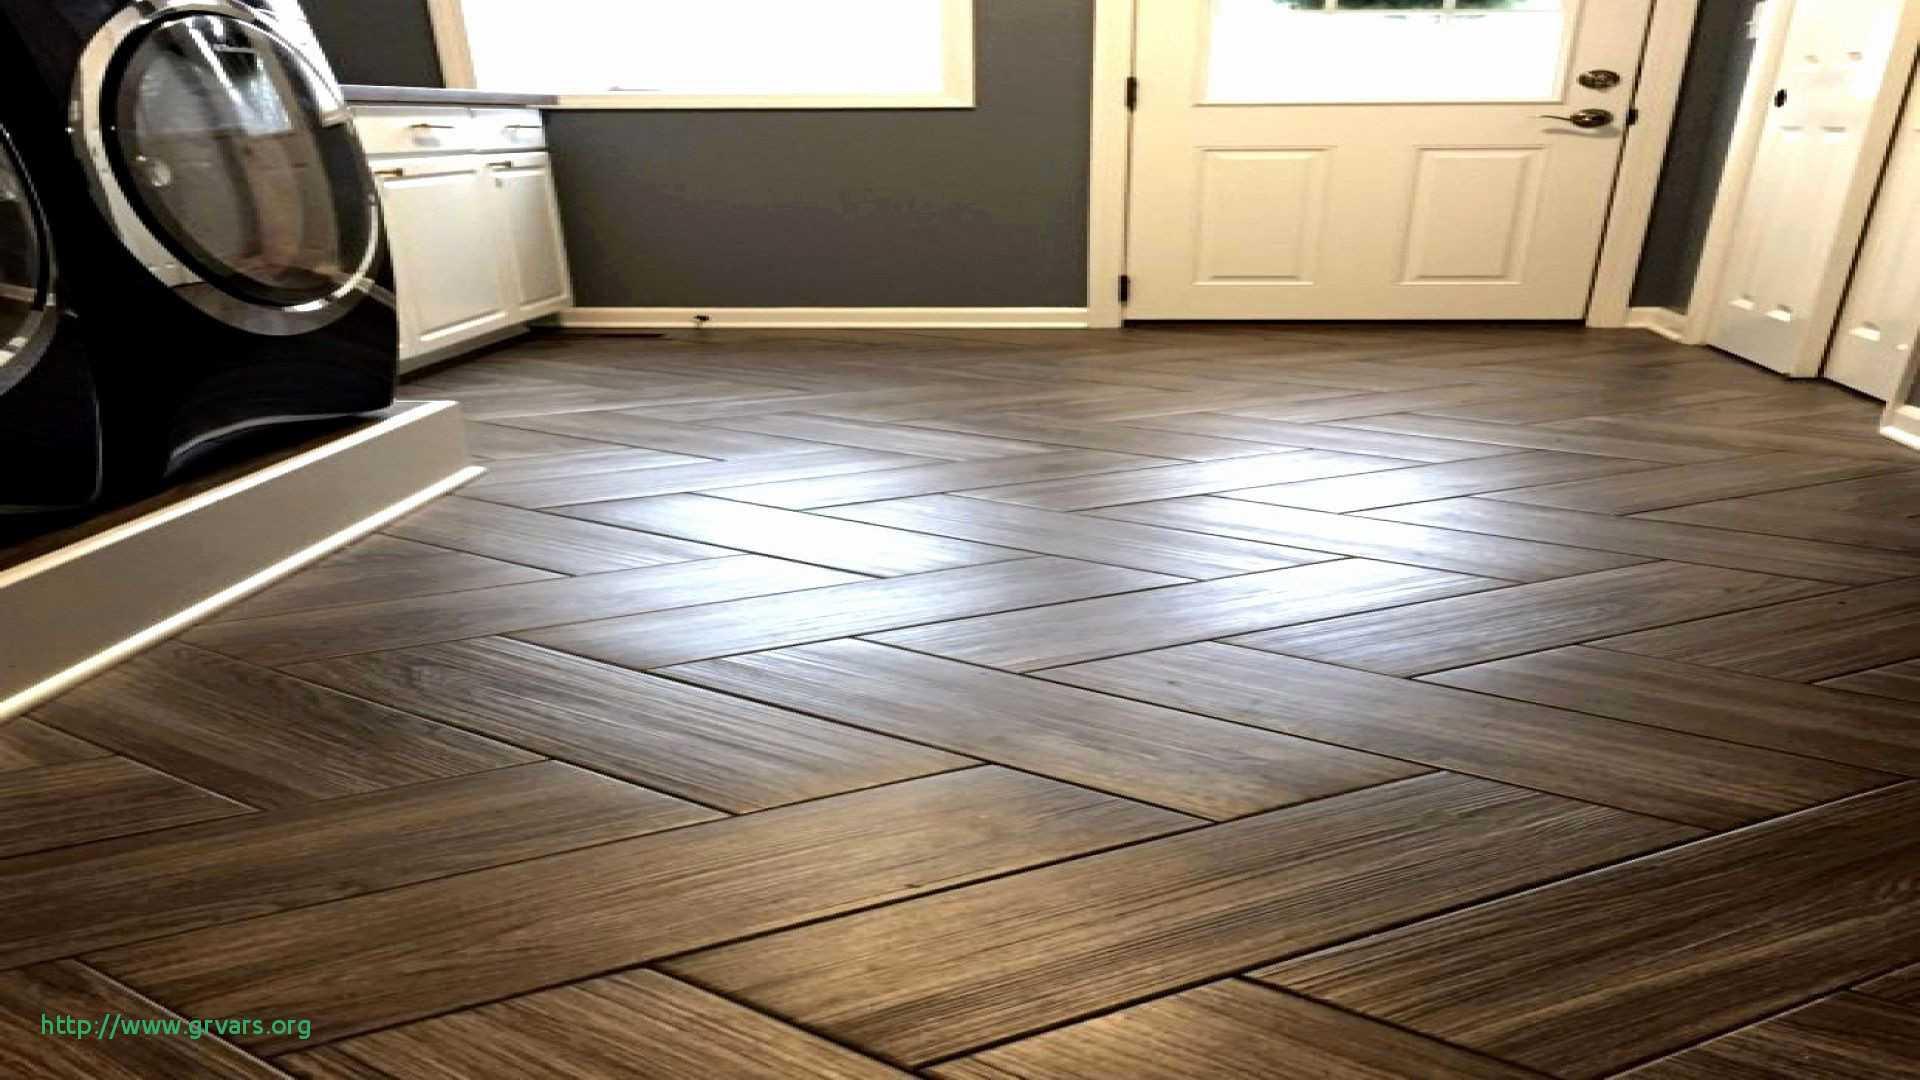 hardwood floor care system of 21 frais multi colored bamboo flooring ideas blog pertaining to kitchen floor tiles home depot elegant s media cache ak0 pinimg 736x 43 0d 97 best